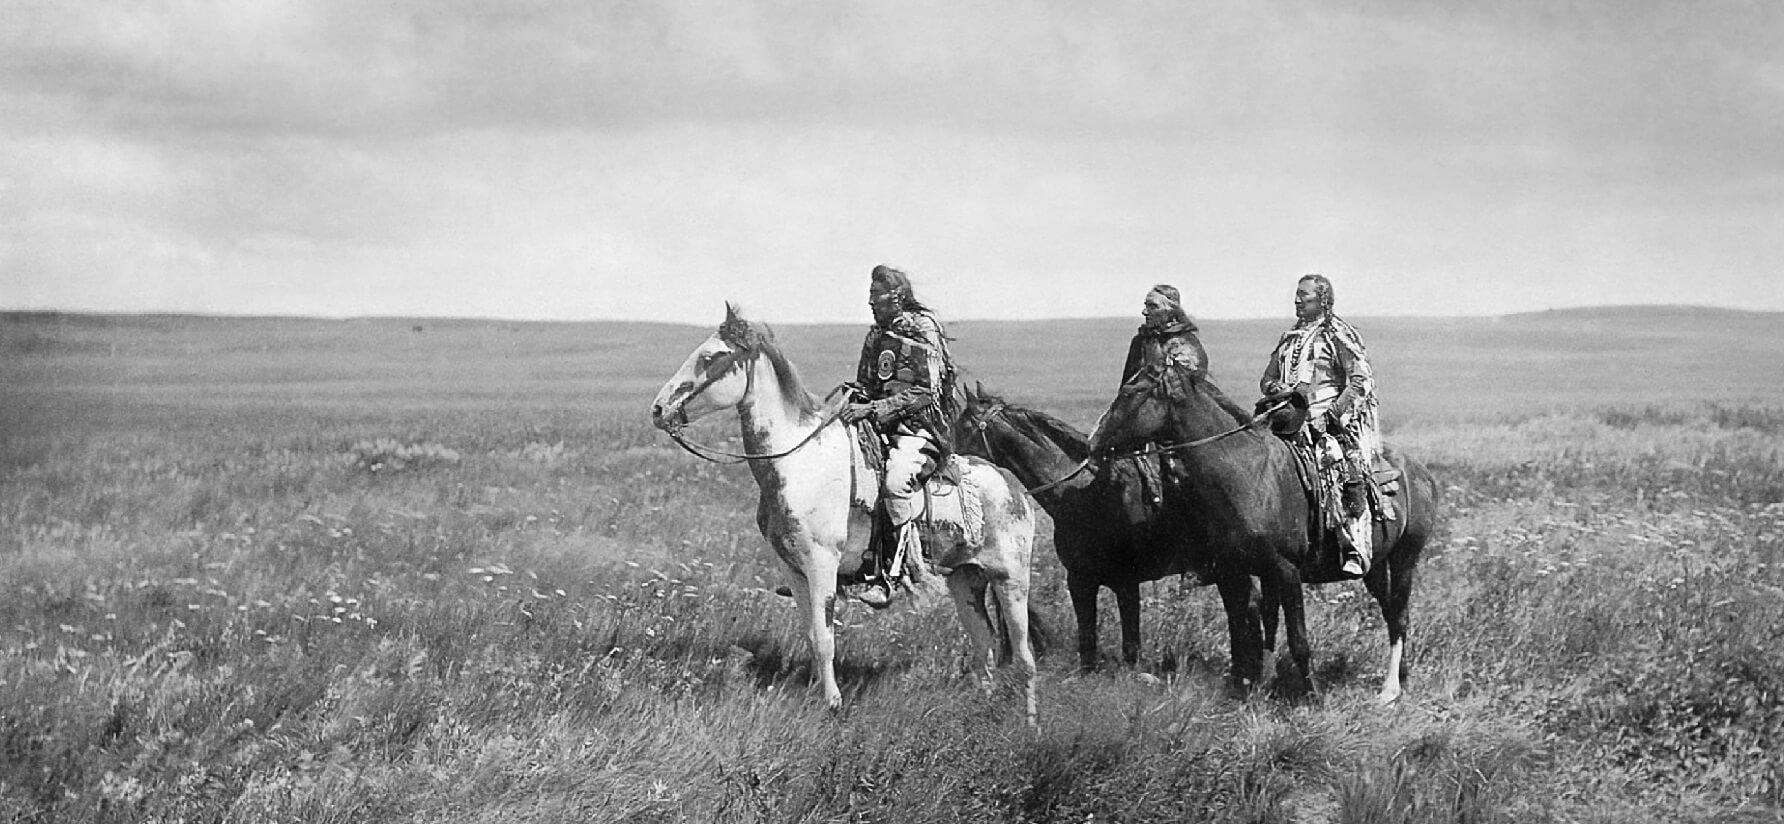 The Green River Renegades were raided by South Peigan Blackfeet.